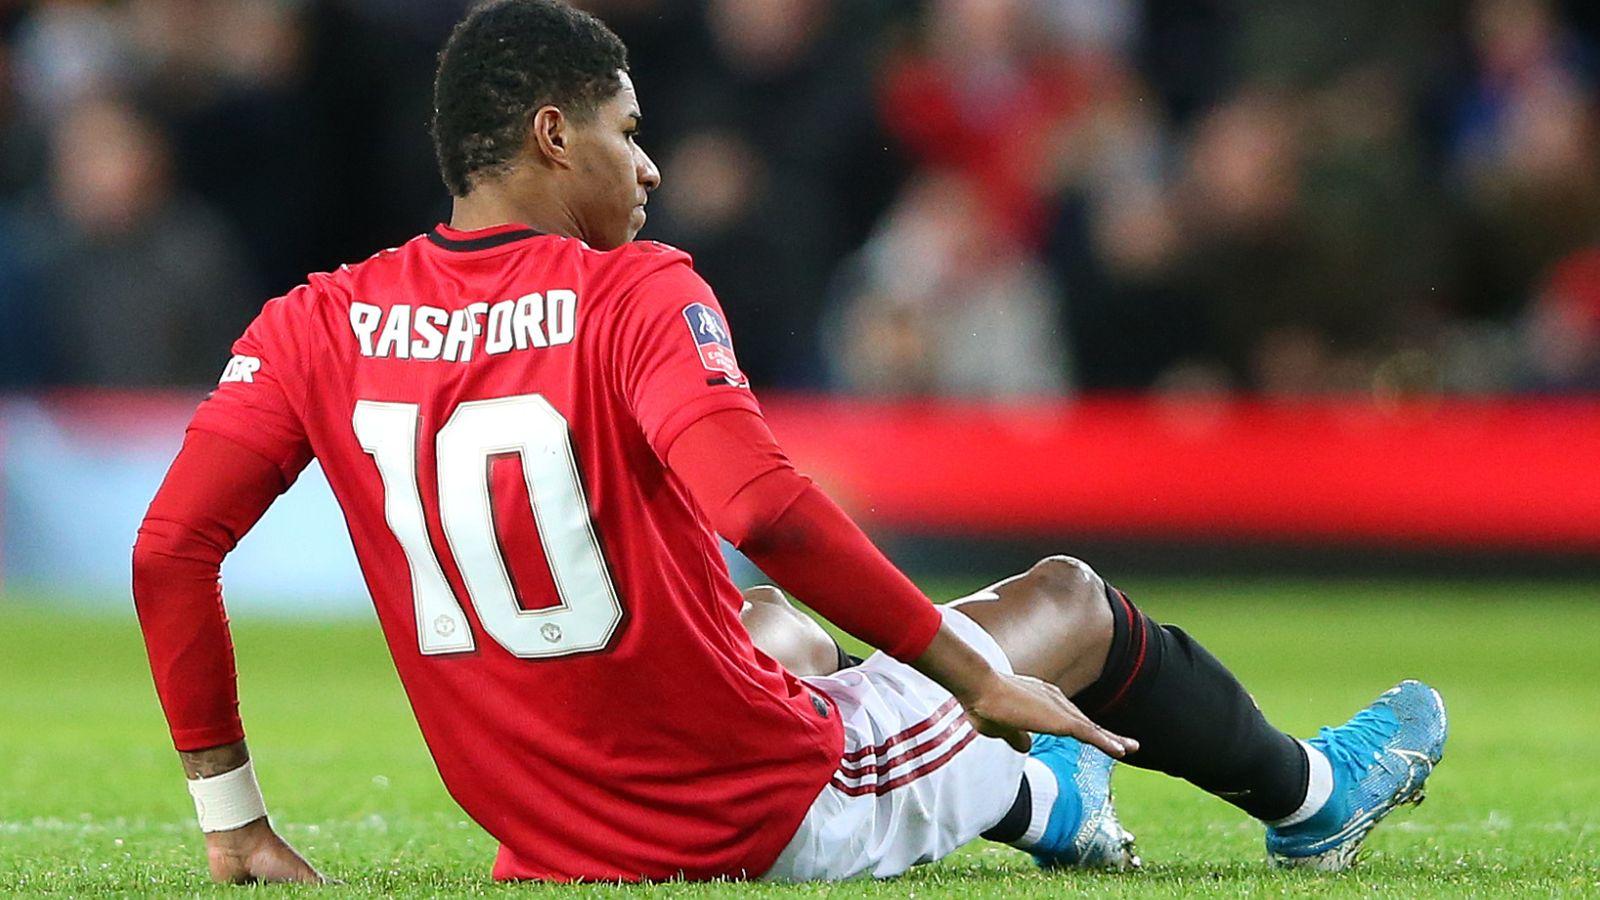 Marcus Rashford 'touch and go' on Manchester United return before end of season, says Ole Gunnar Solskjaer